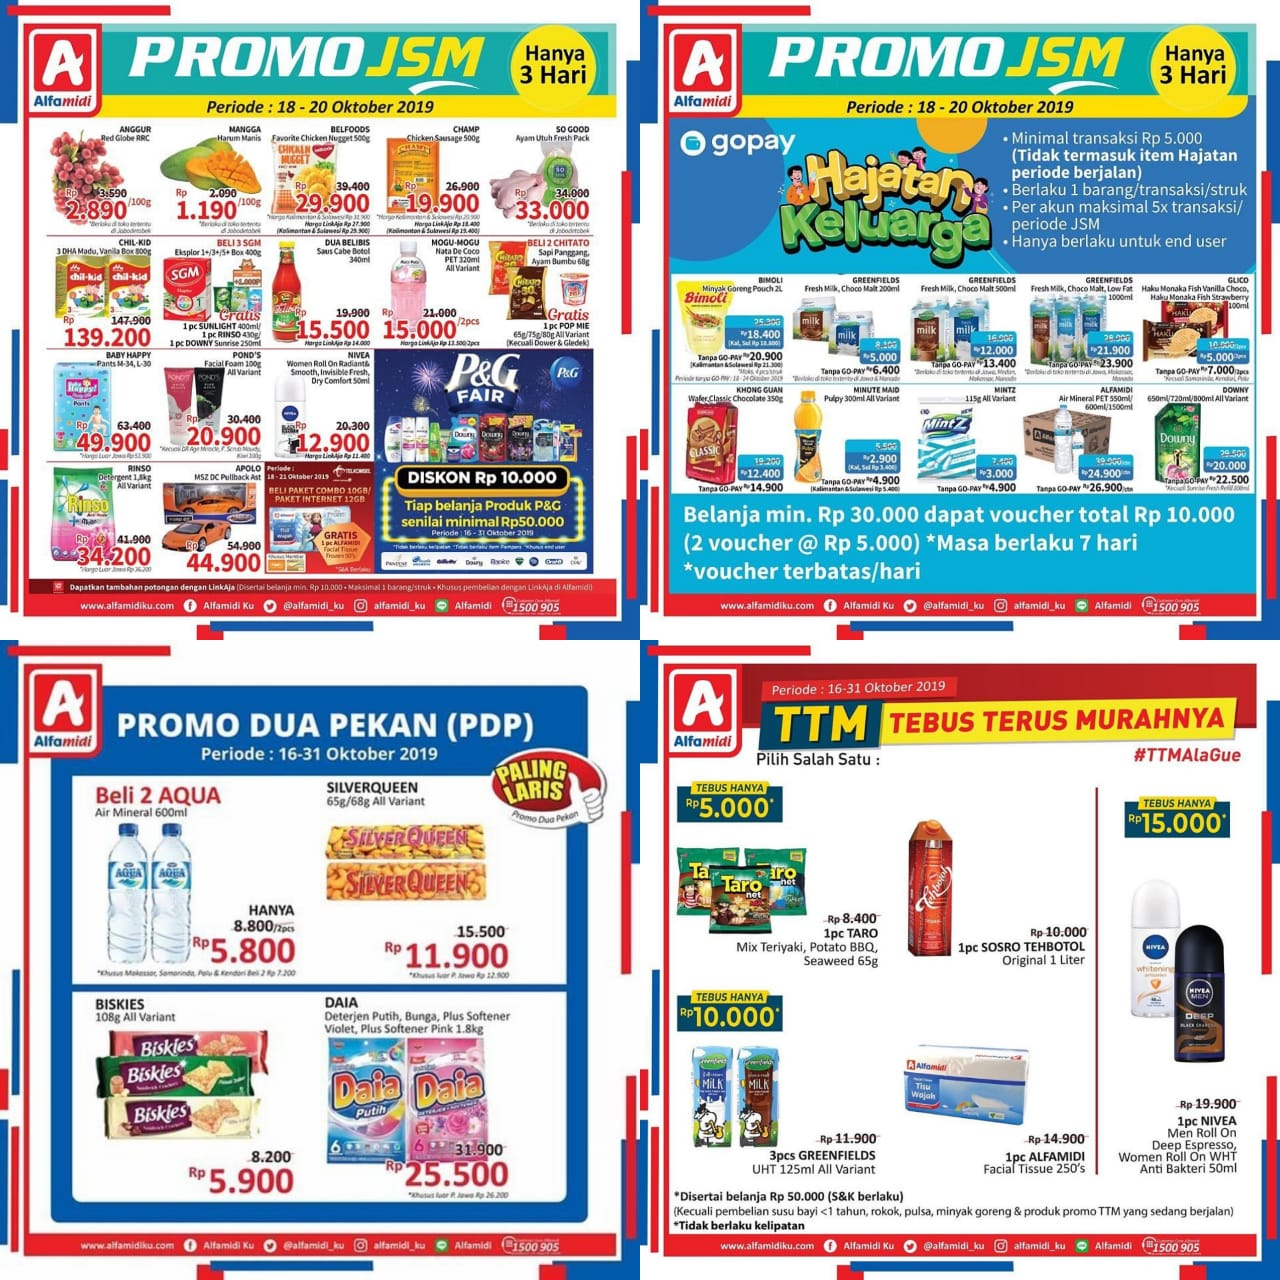 Katalog Promo JSM Alfamidi Periode 18-20 Oktober 2019